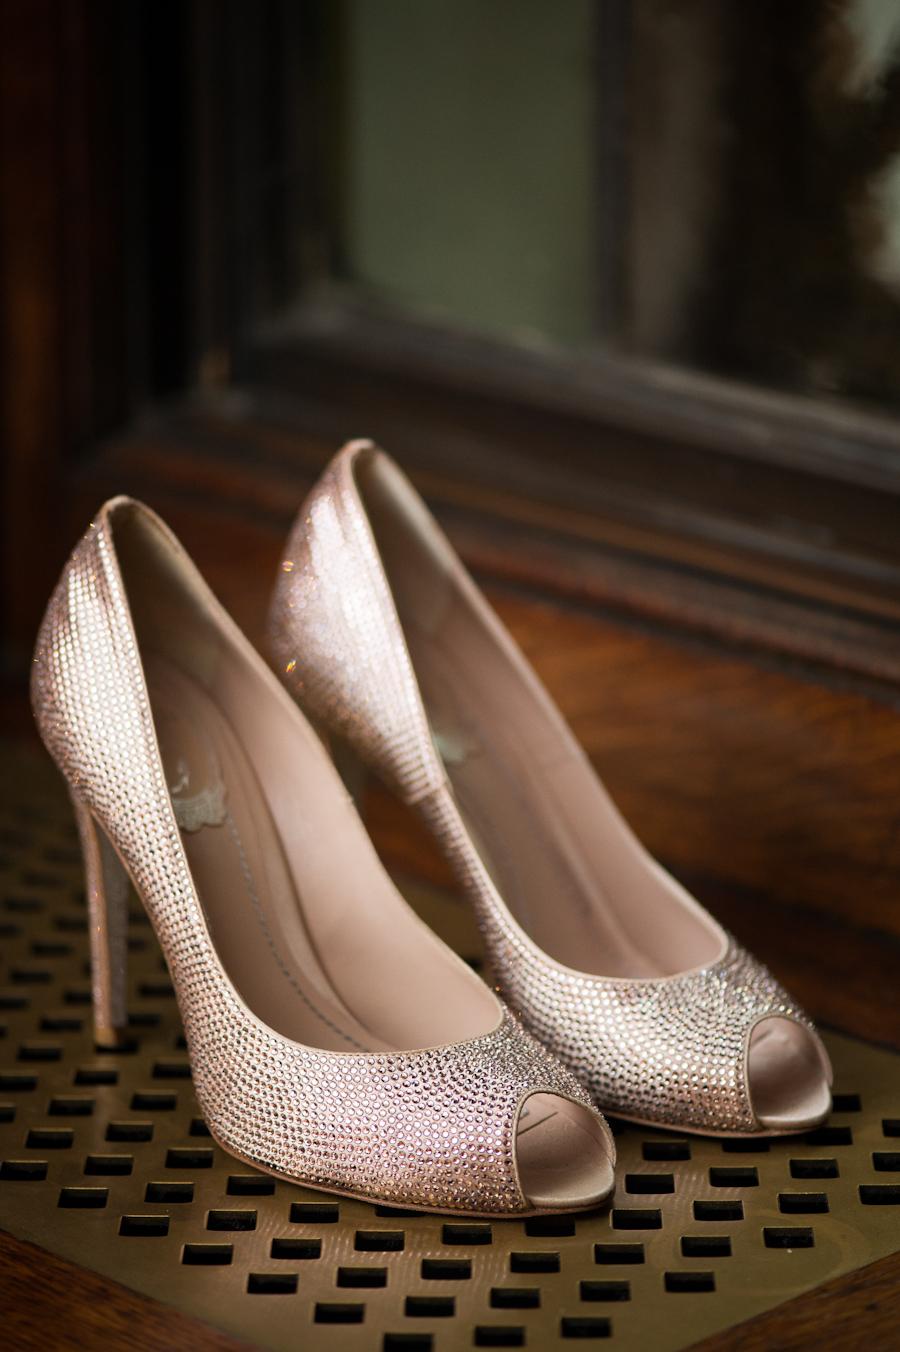 gotham hall brian hatton ang weddings and events-22.jpg